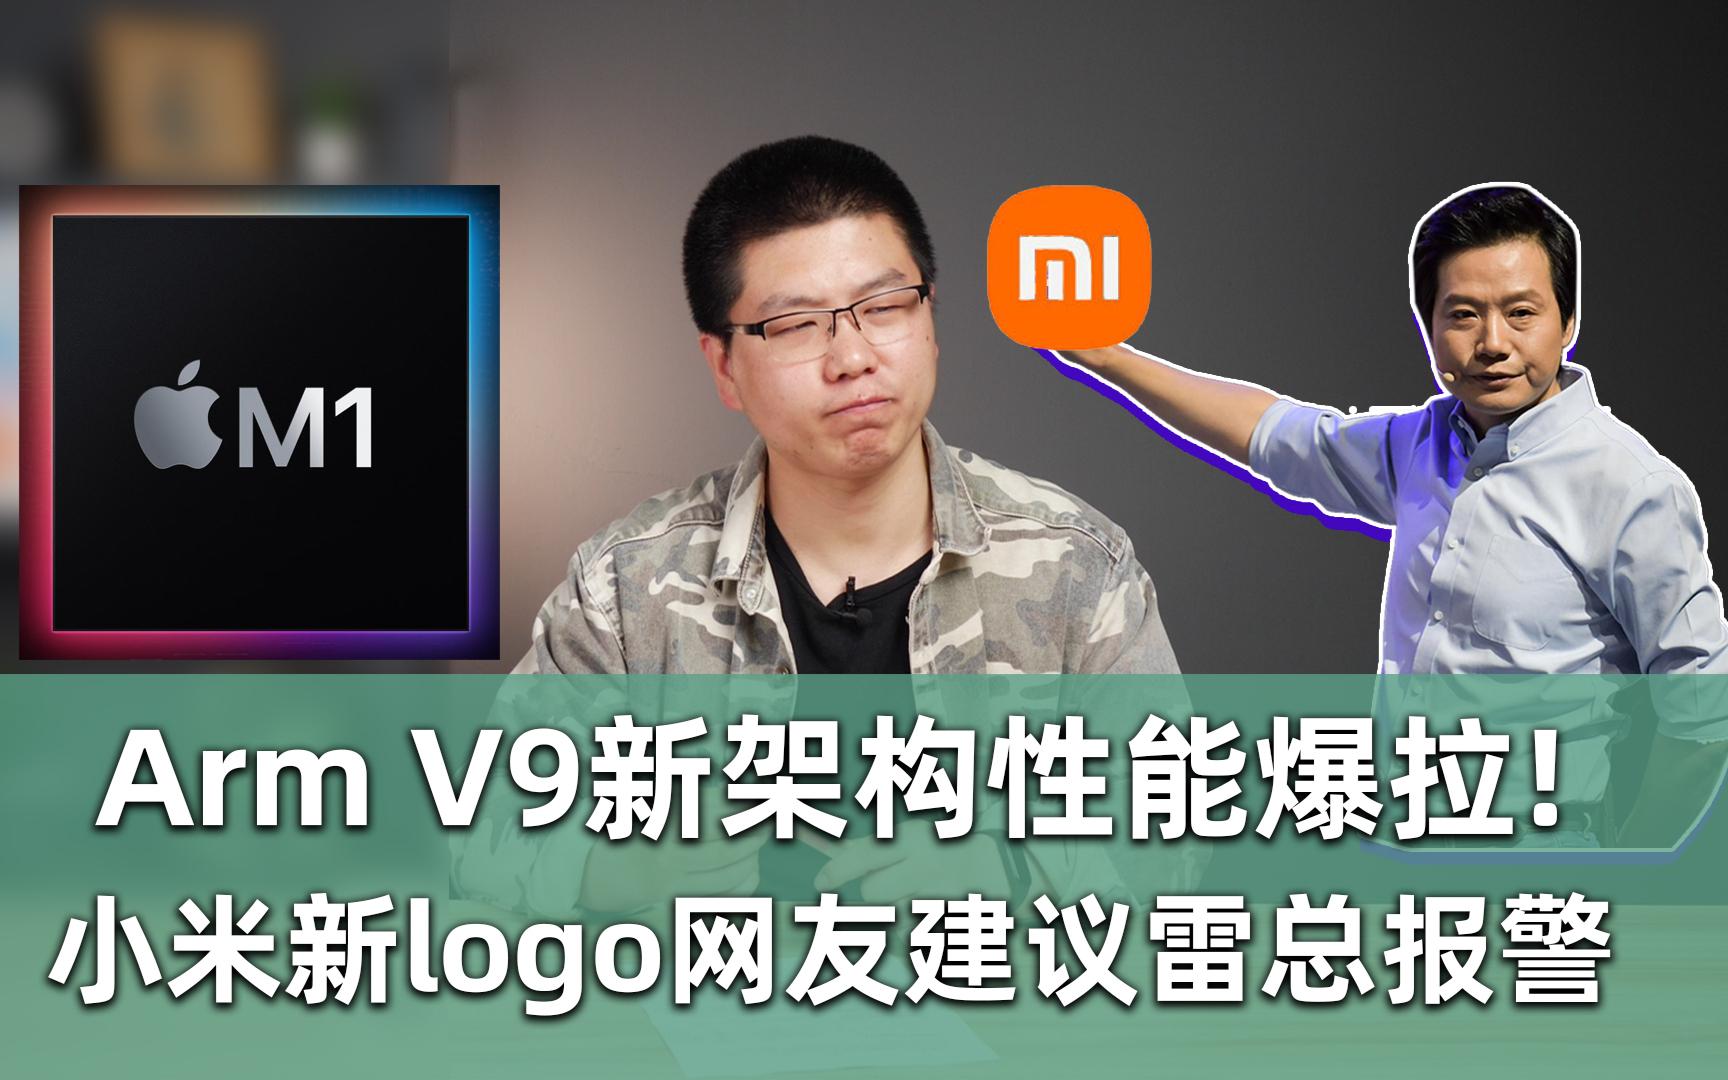 【E周报】55:Arm V9新架构性能爆拉!小米新logo网友建议雷总报警